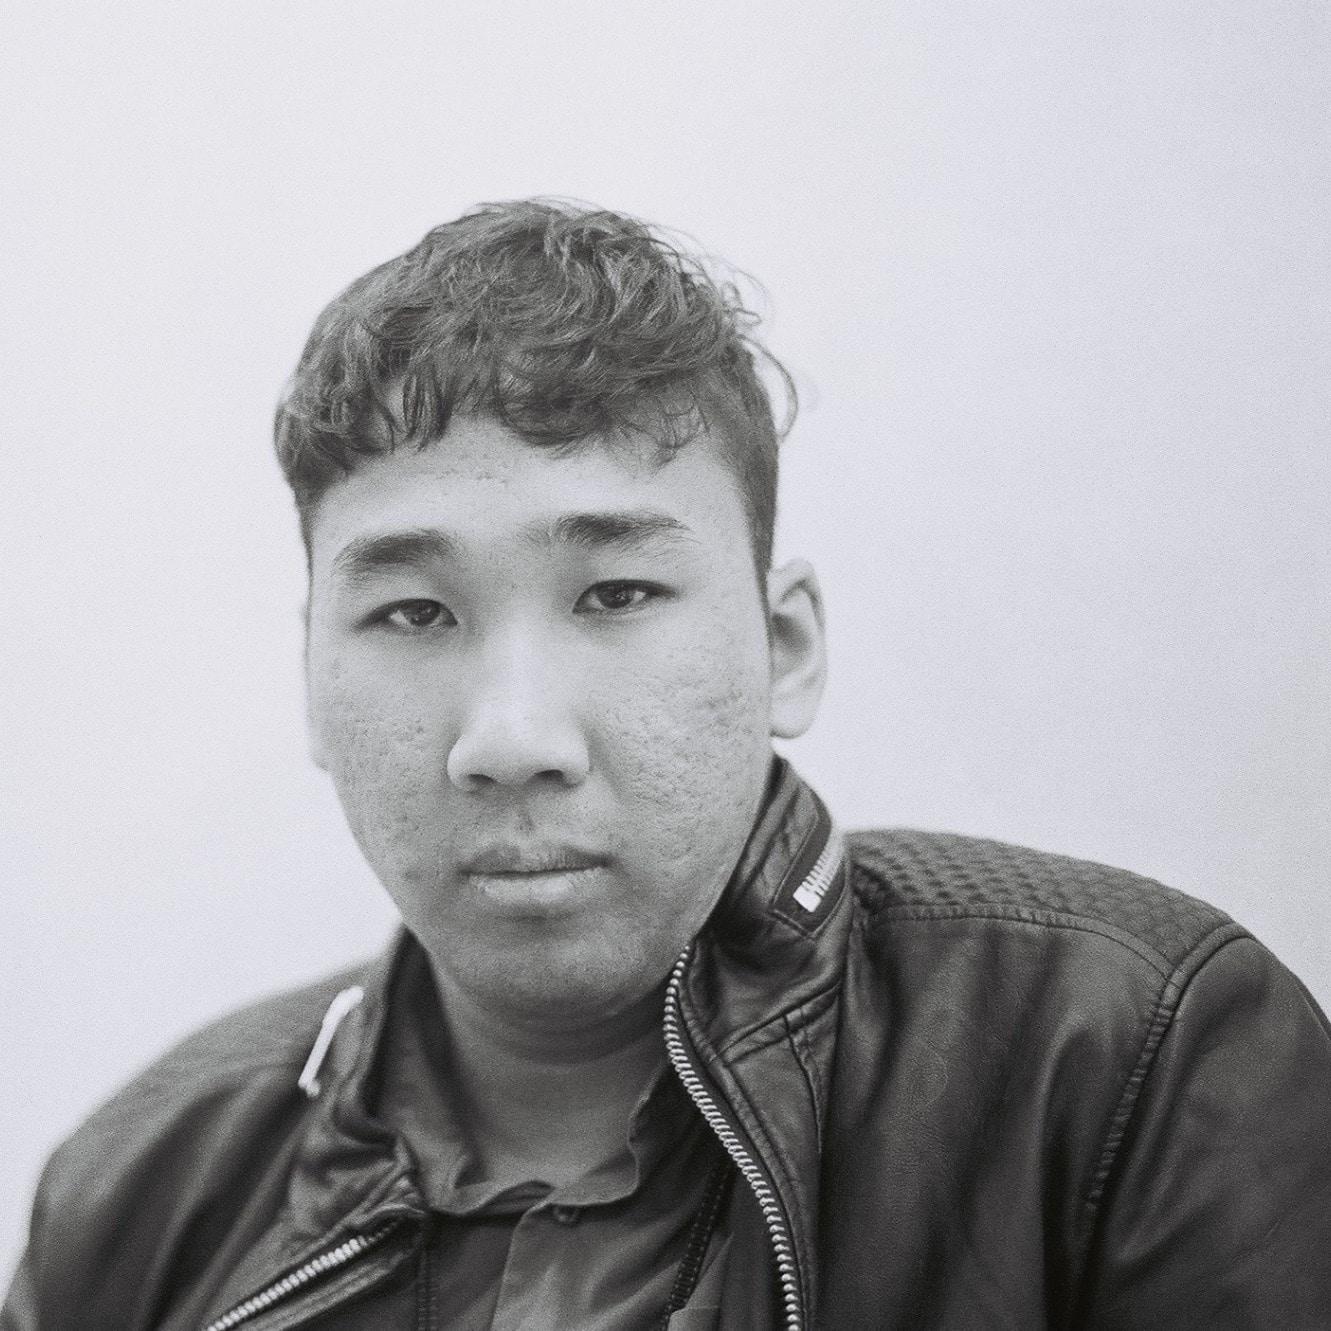 Go to Tanarut Juntee's profile